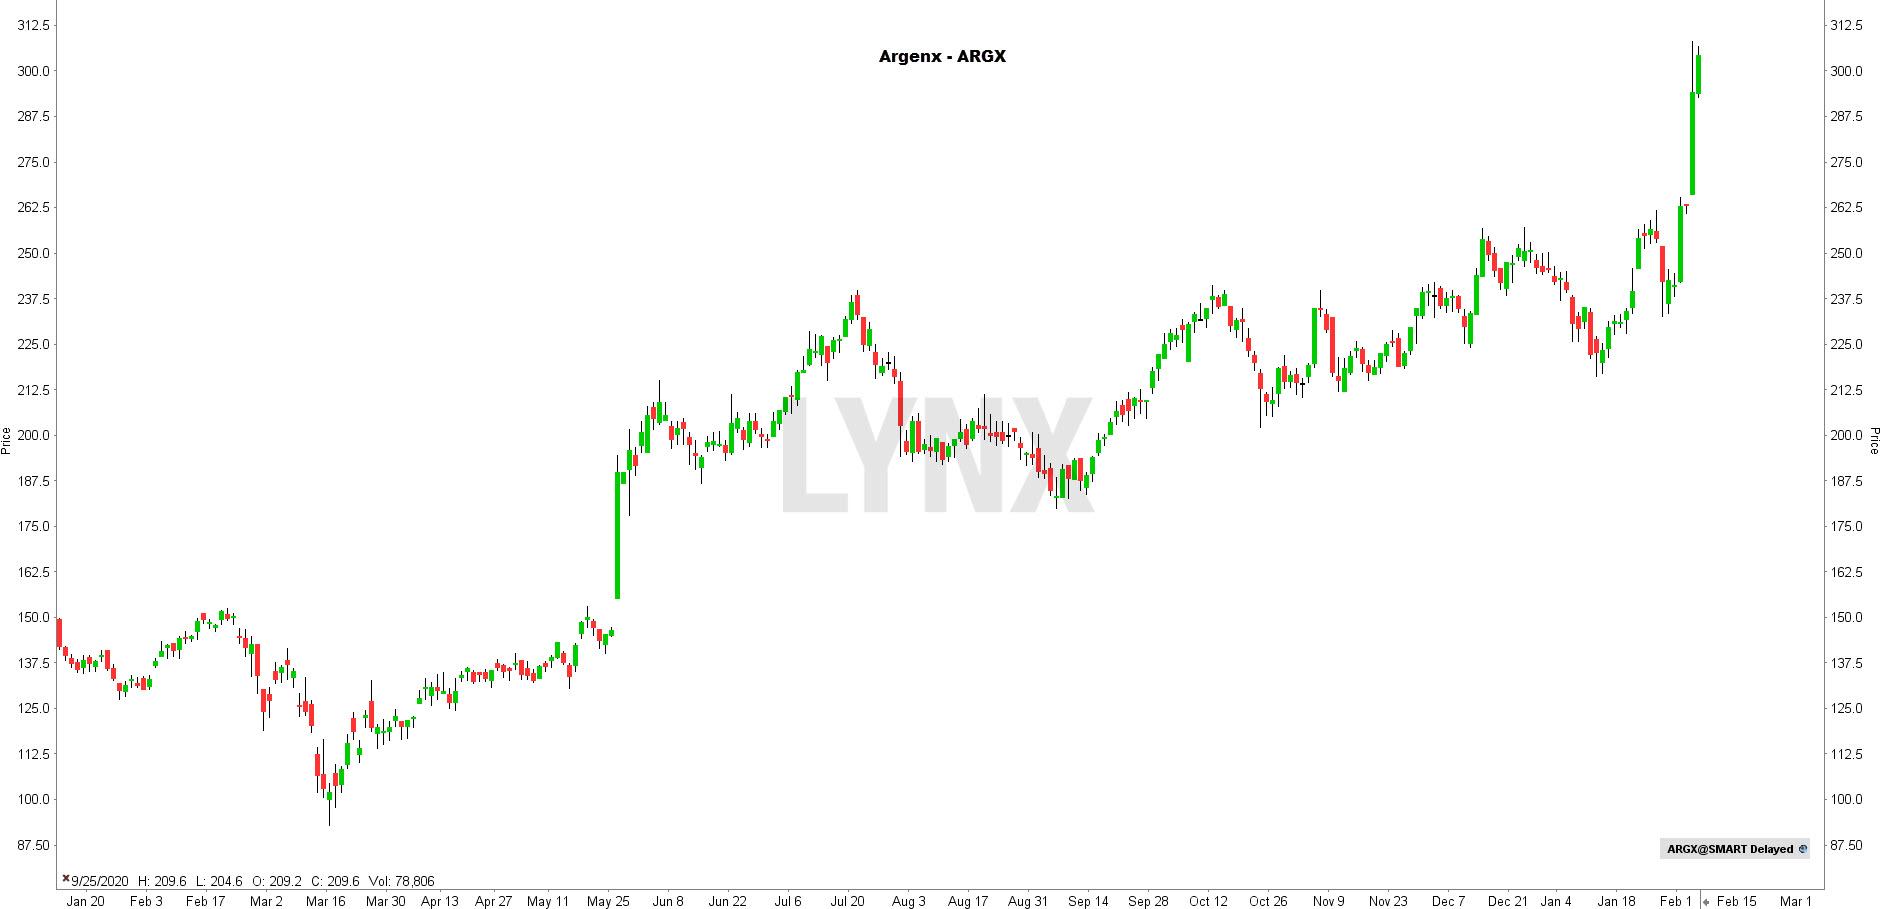 Aandeel Argenx koers terug op dreef